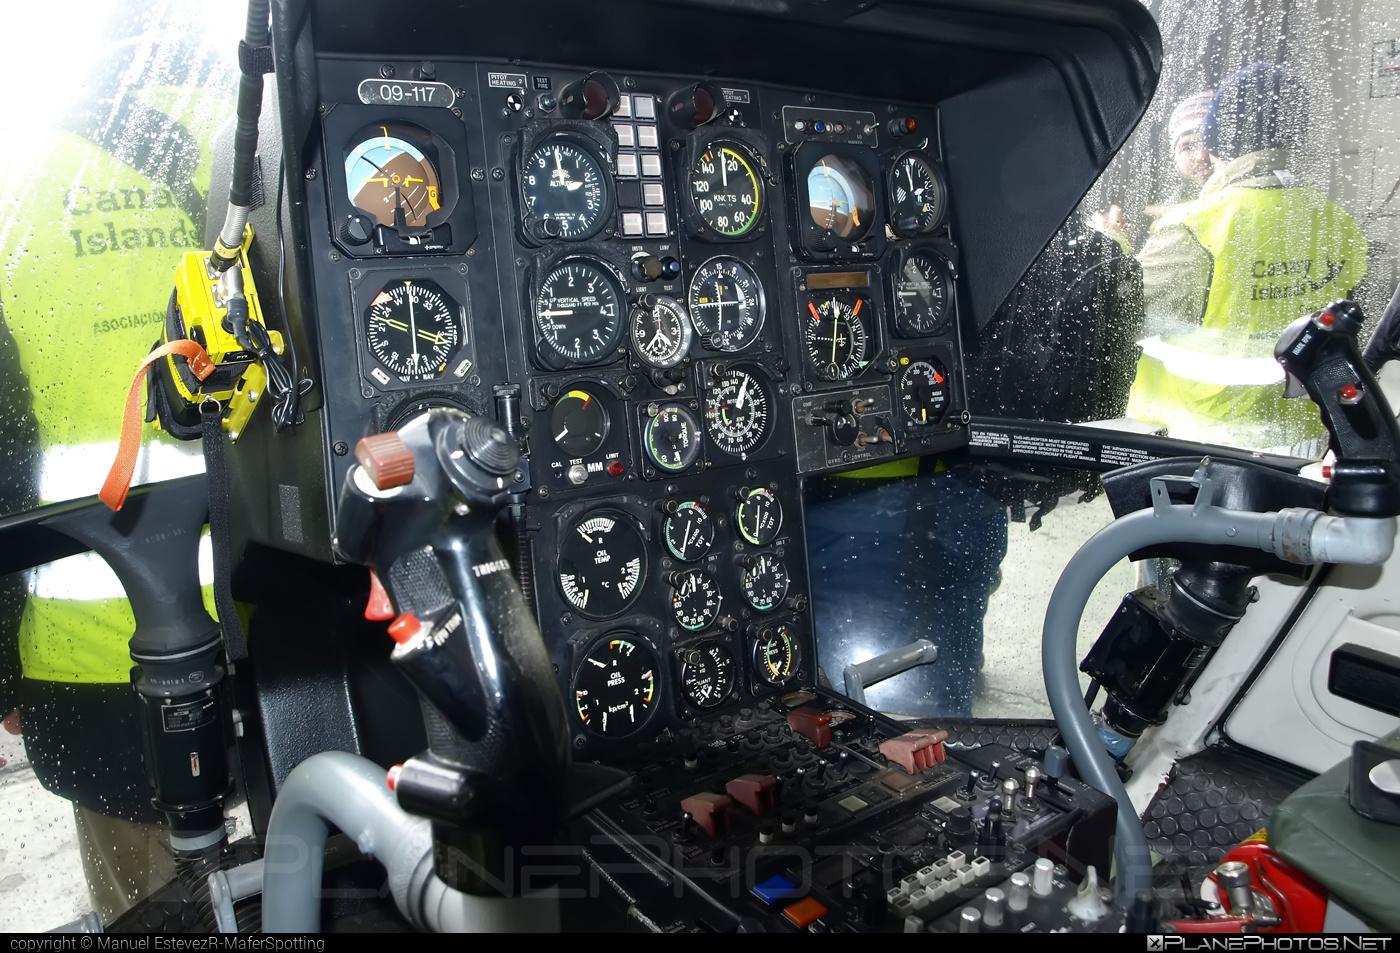 MBB Bo 105CBS-4 - HU.15-89 operated by Guardia Civil (Spanish Civil Guard) #mbb